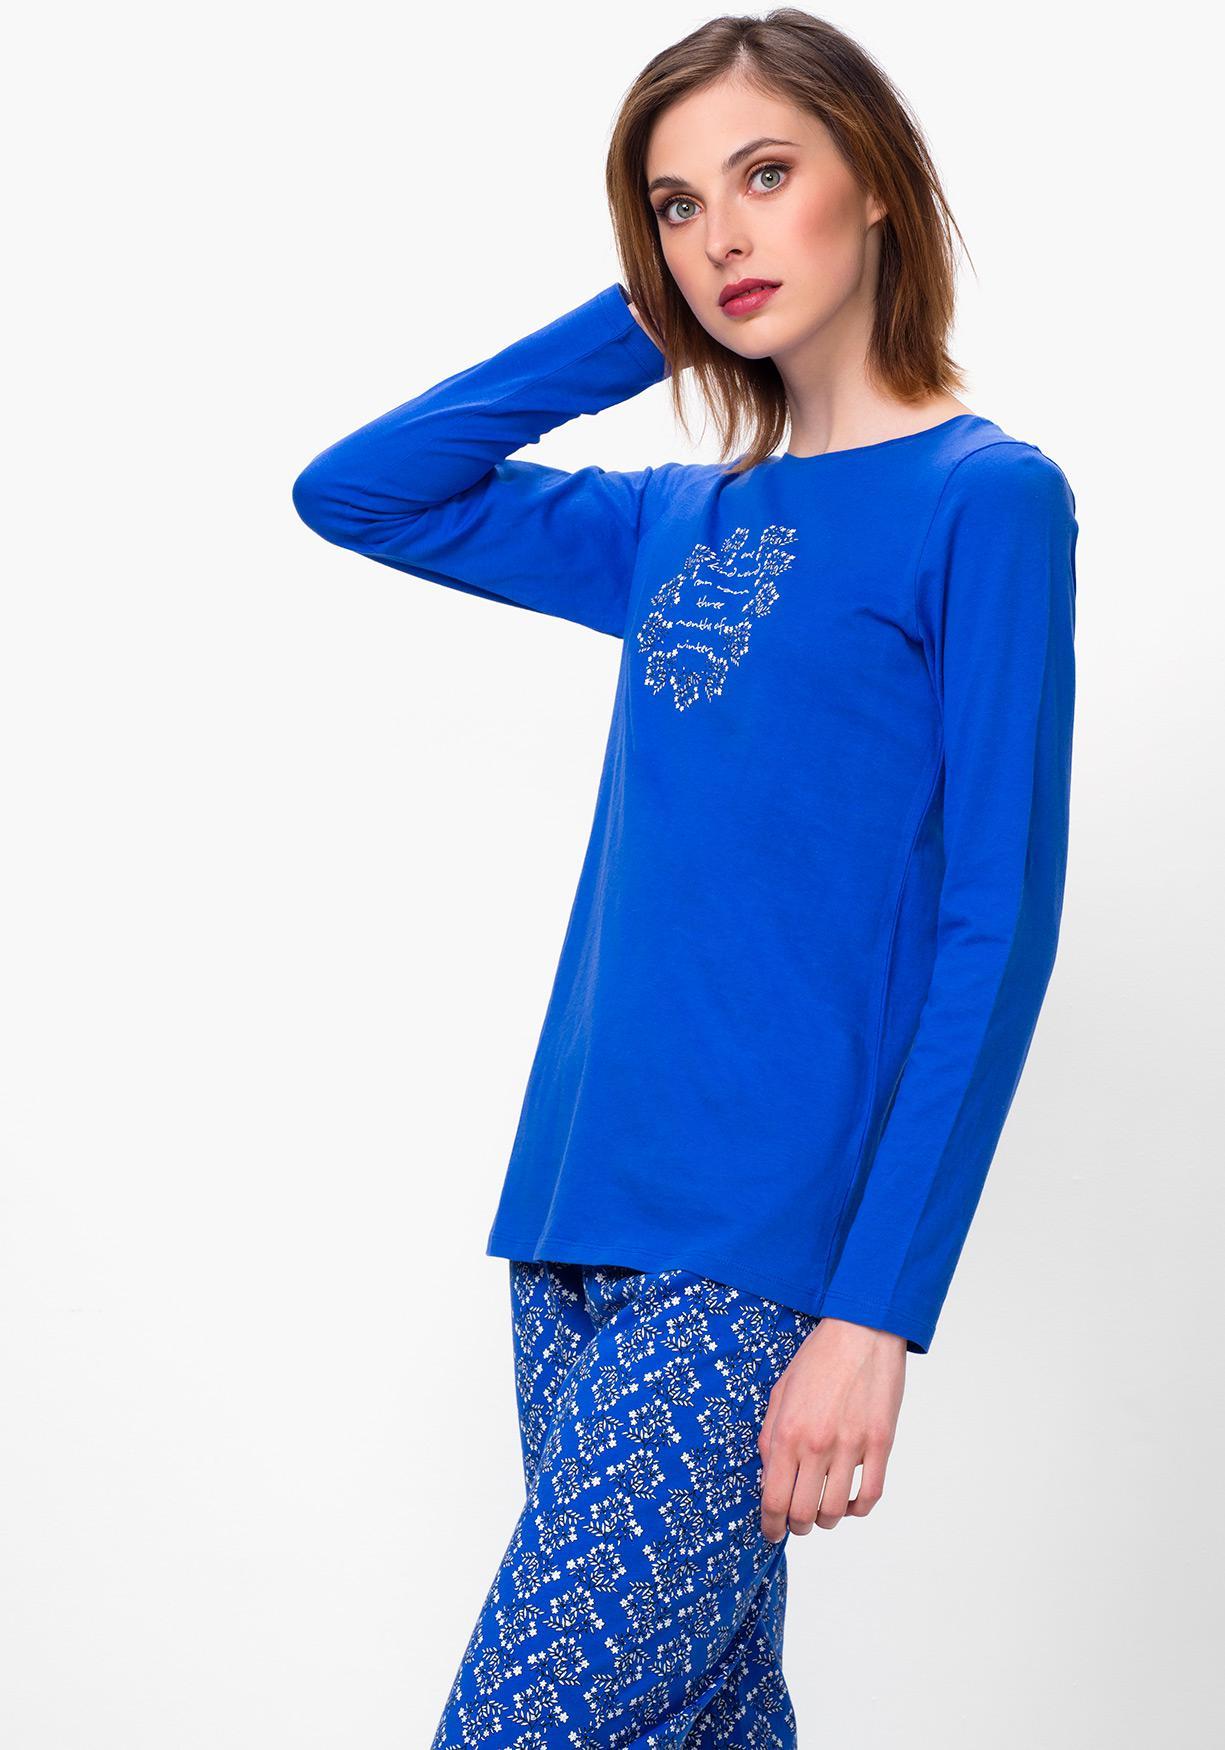 4ebd773ba3 Comprar Pijama de mujer con manga larga TEX. ¡Aprovéchate de ...